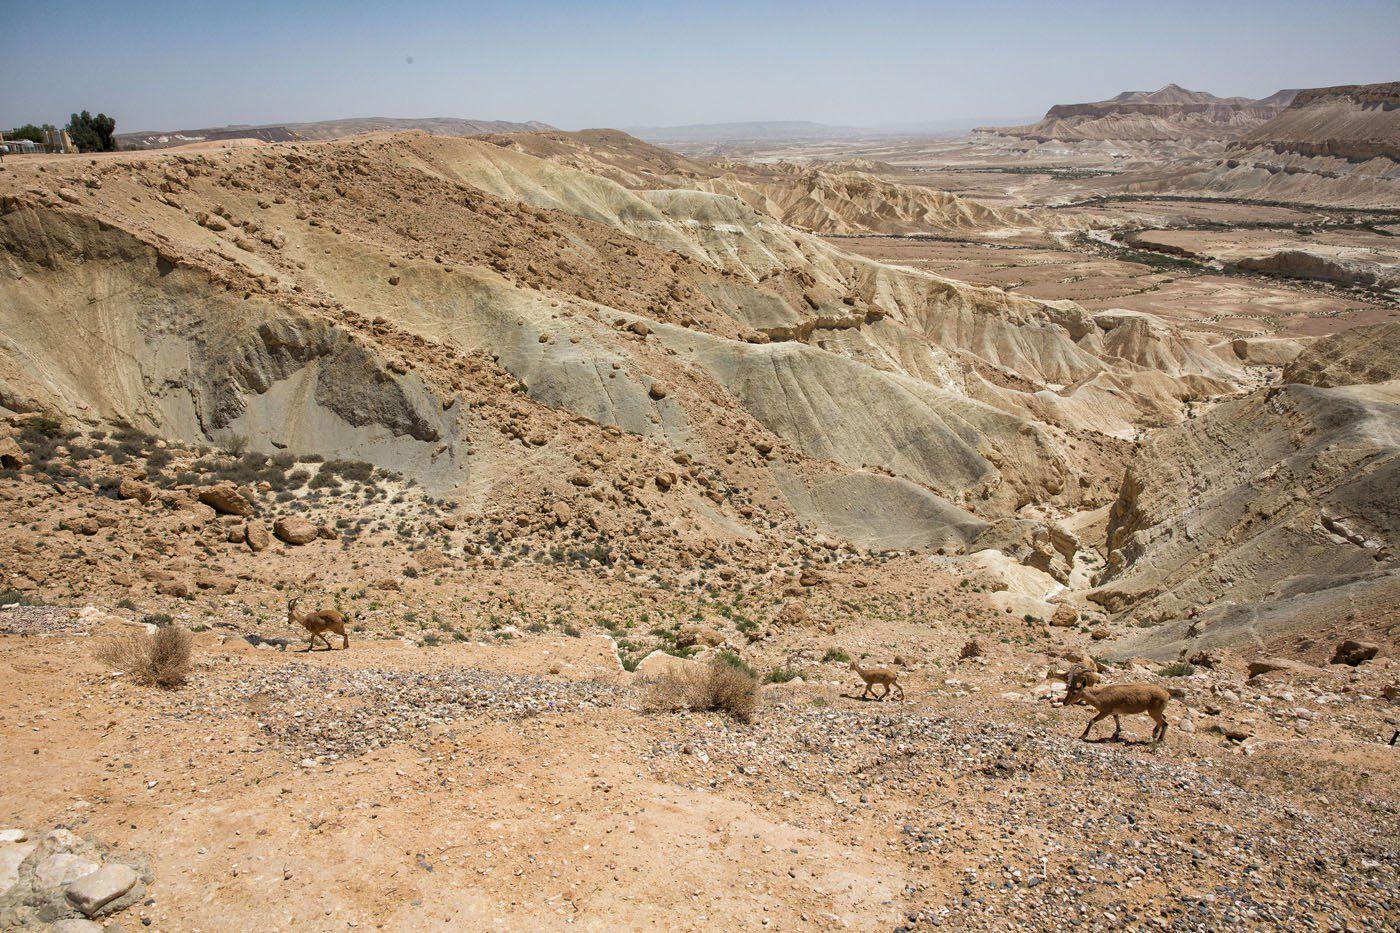 Negev Desert Israel and Jordan itinerary